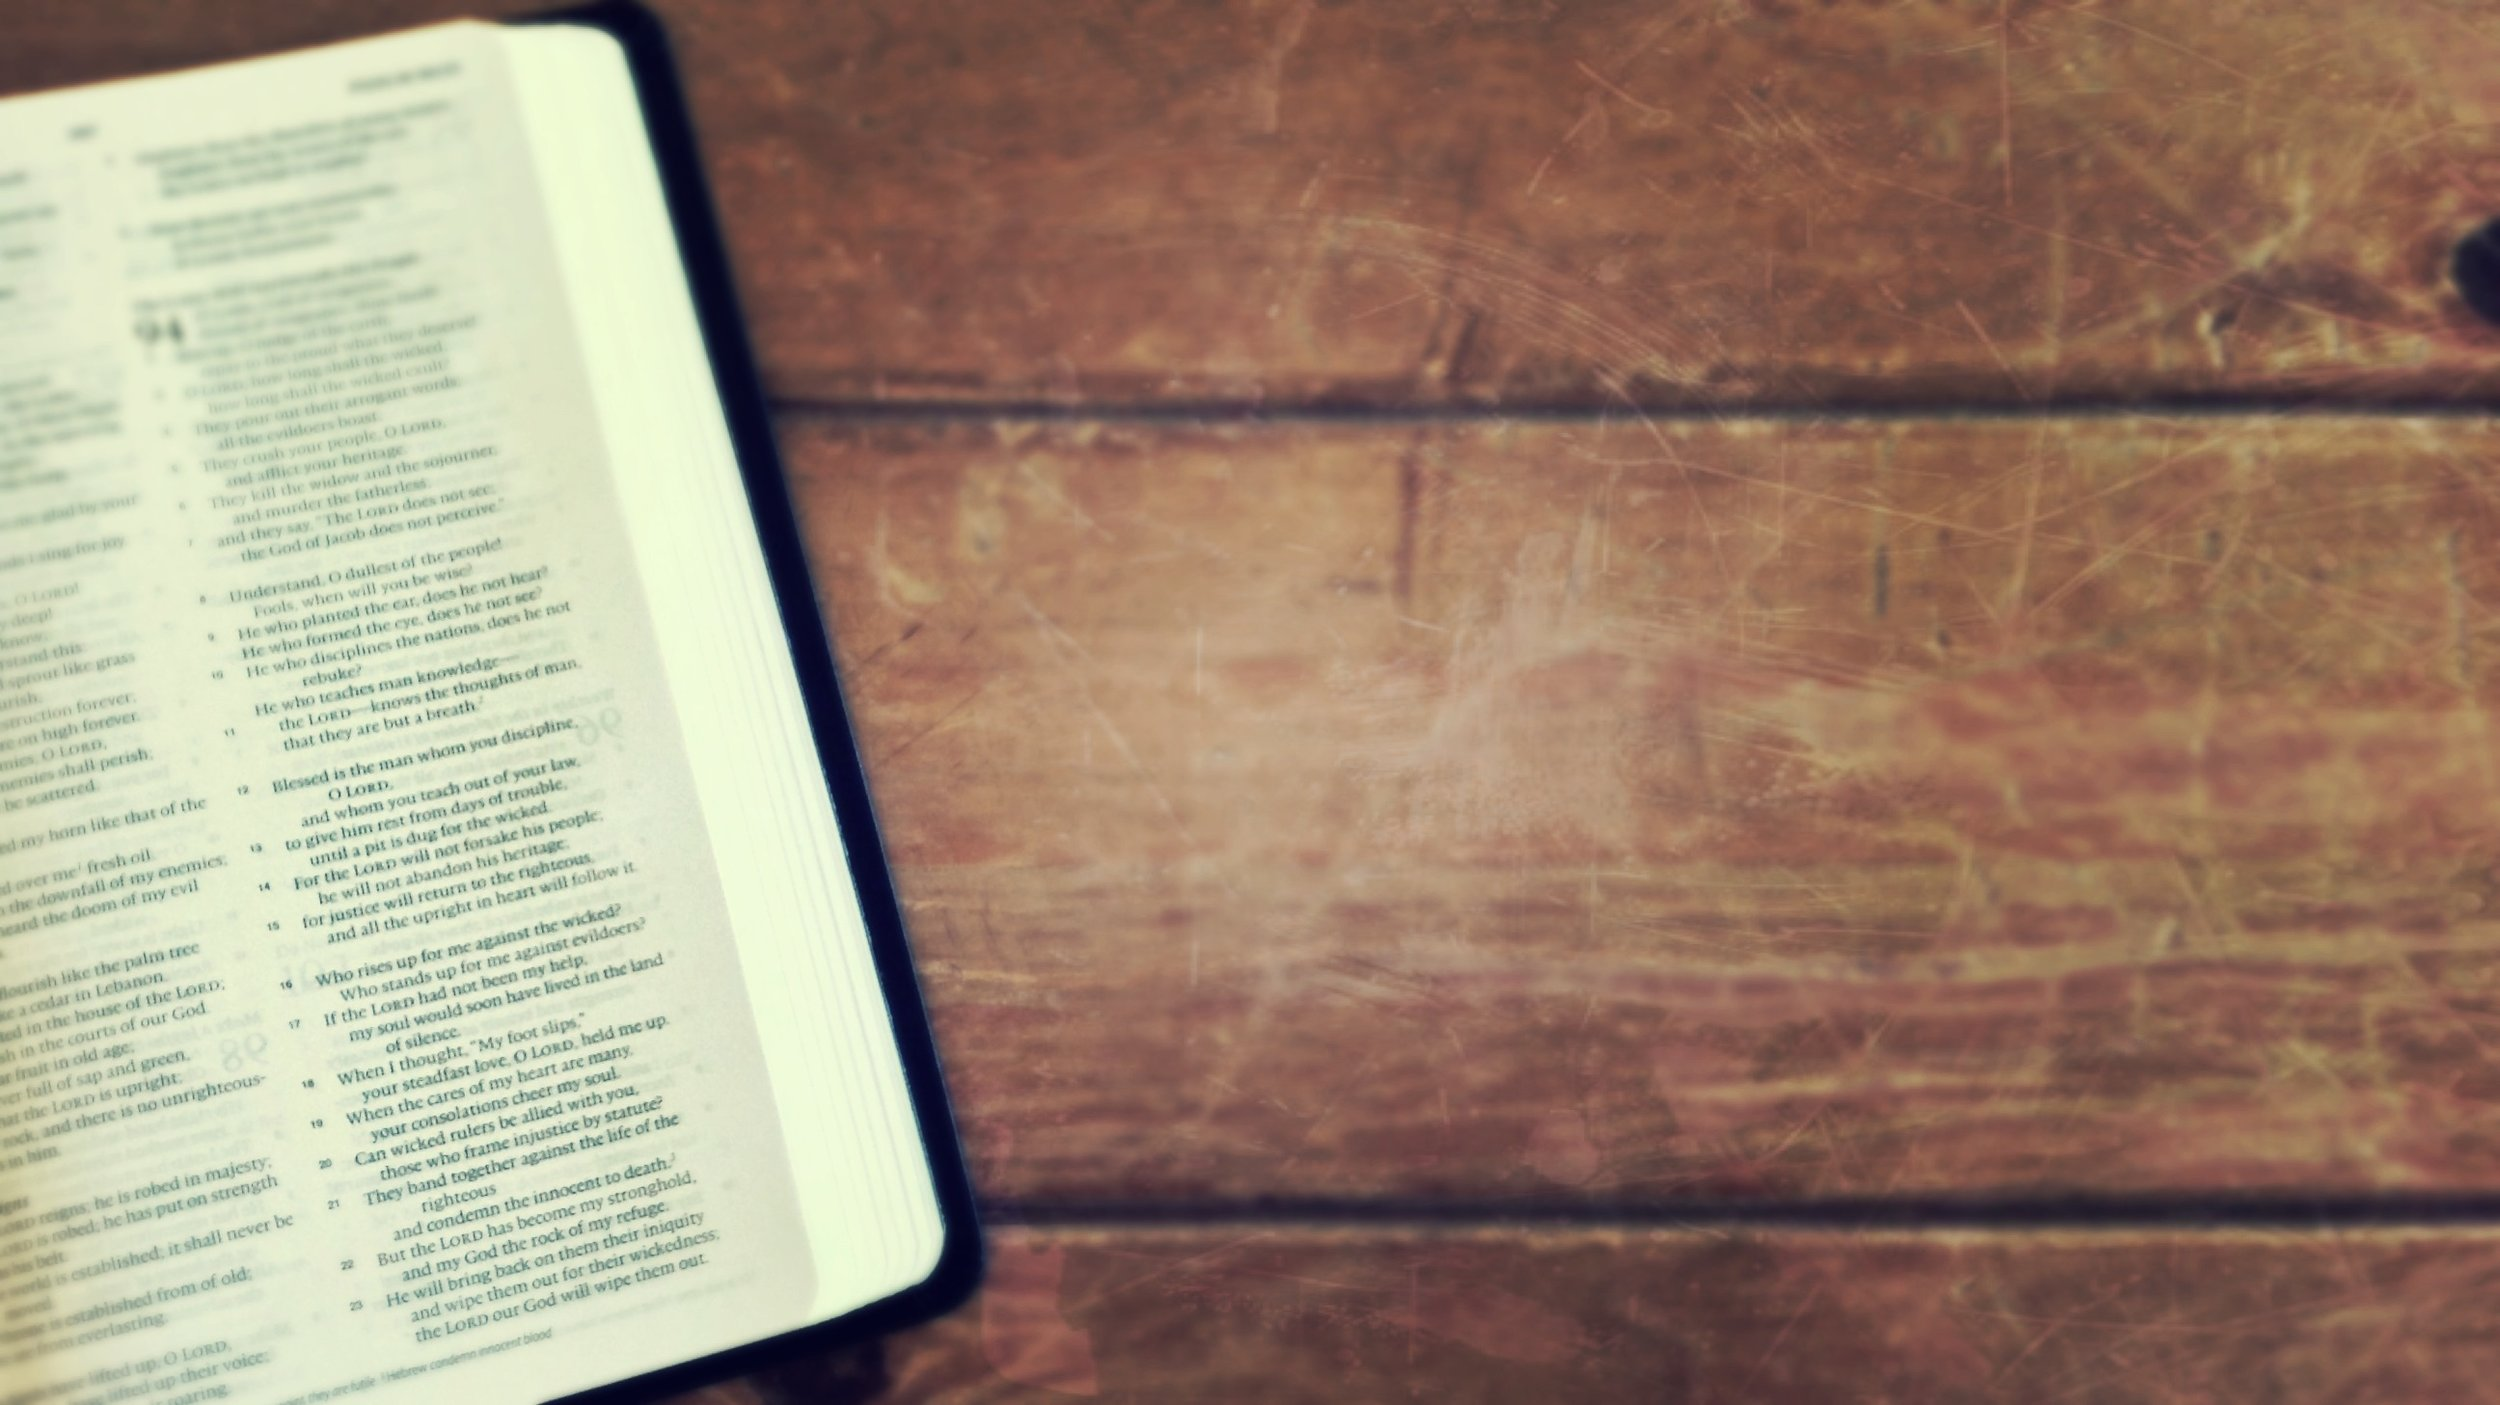 Bible on Table.jpg